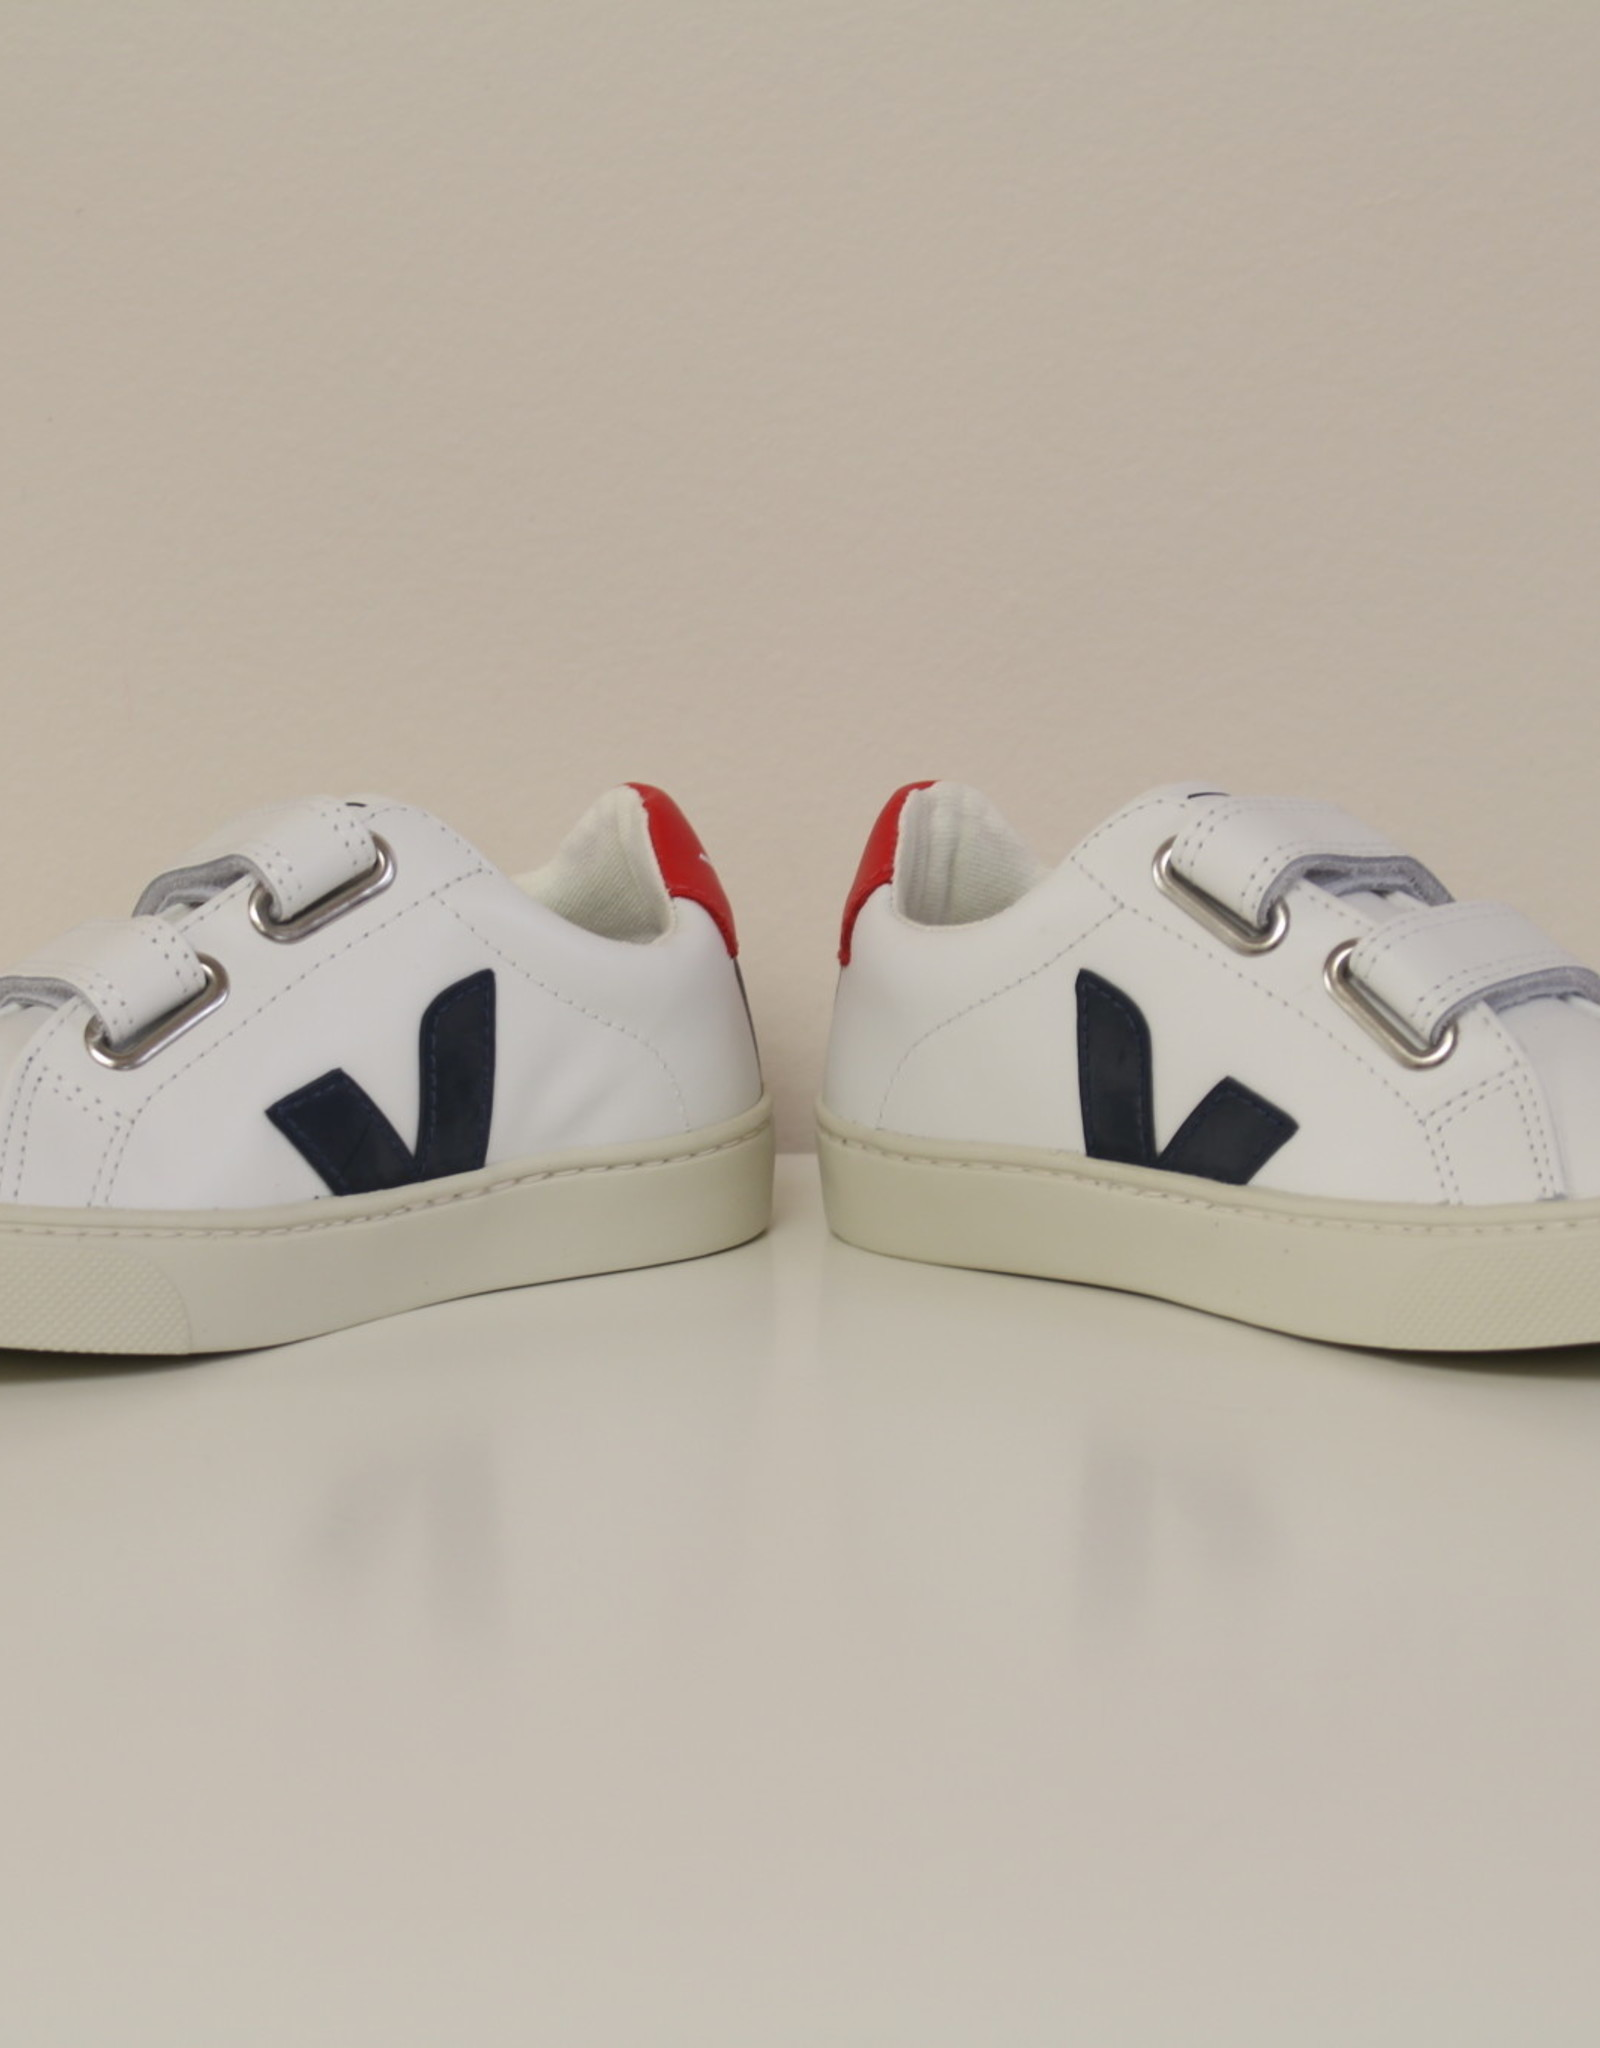 VEJA RSJV021233 sneaker wit blauw rood velcro